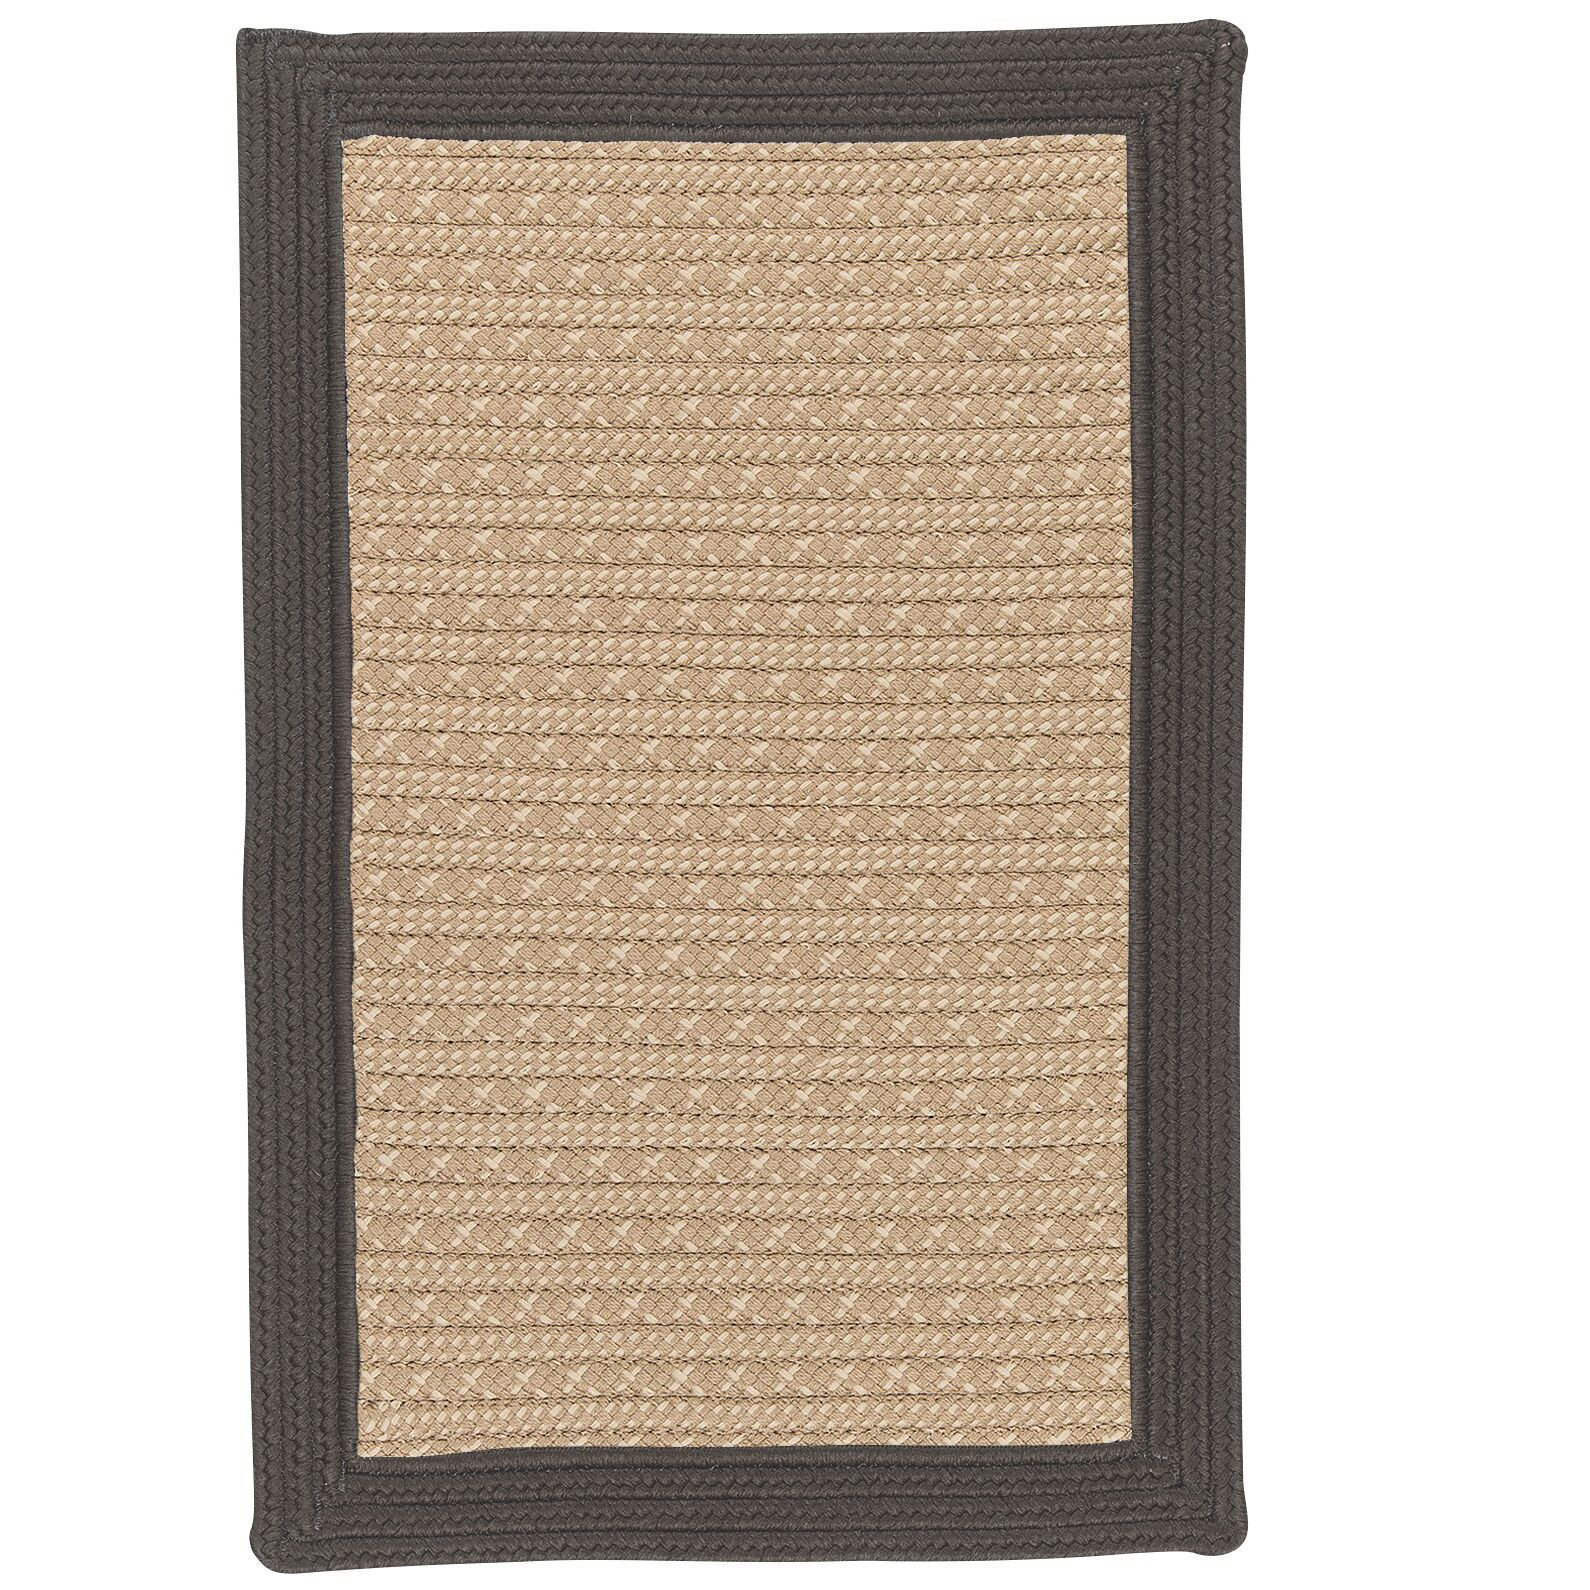 Dartmouth Hand-Woven Gray Indoor/Outdoor Area Rug Rug Size: 8' x 10'